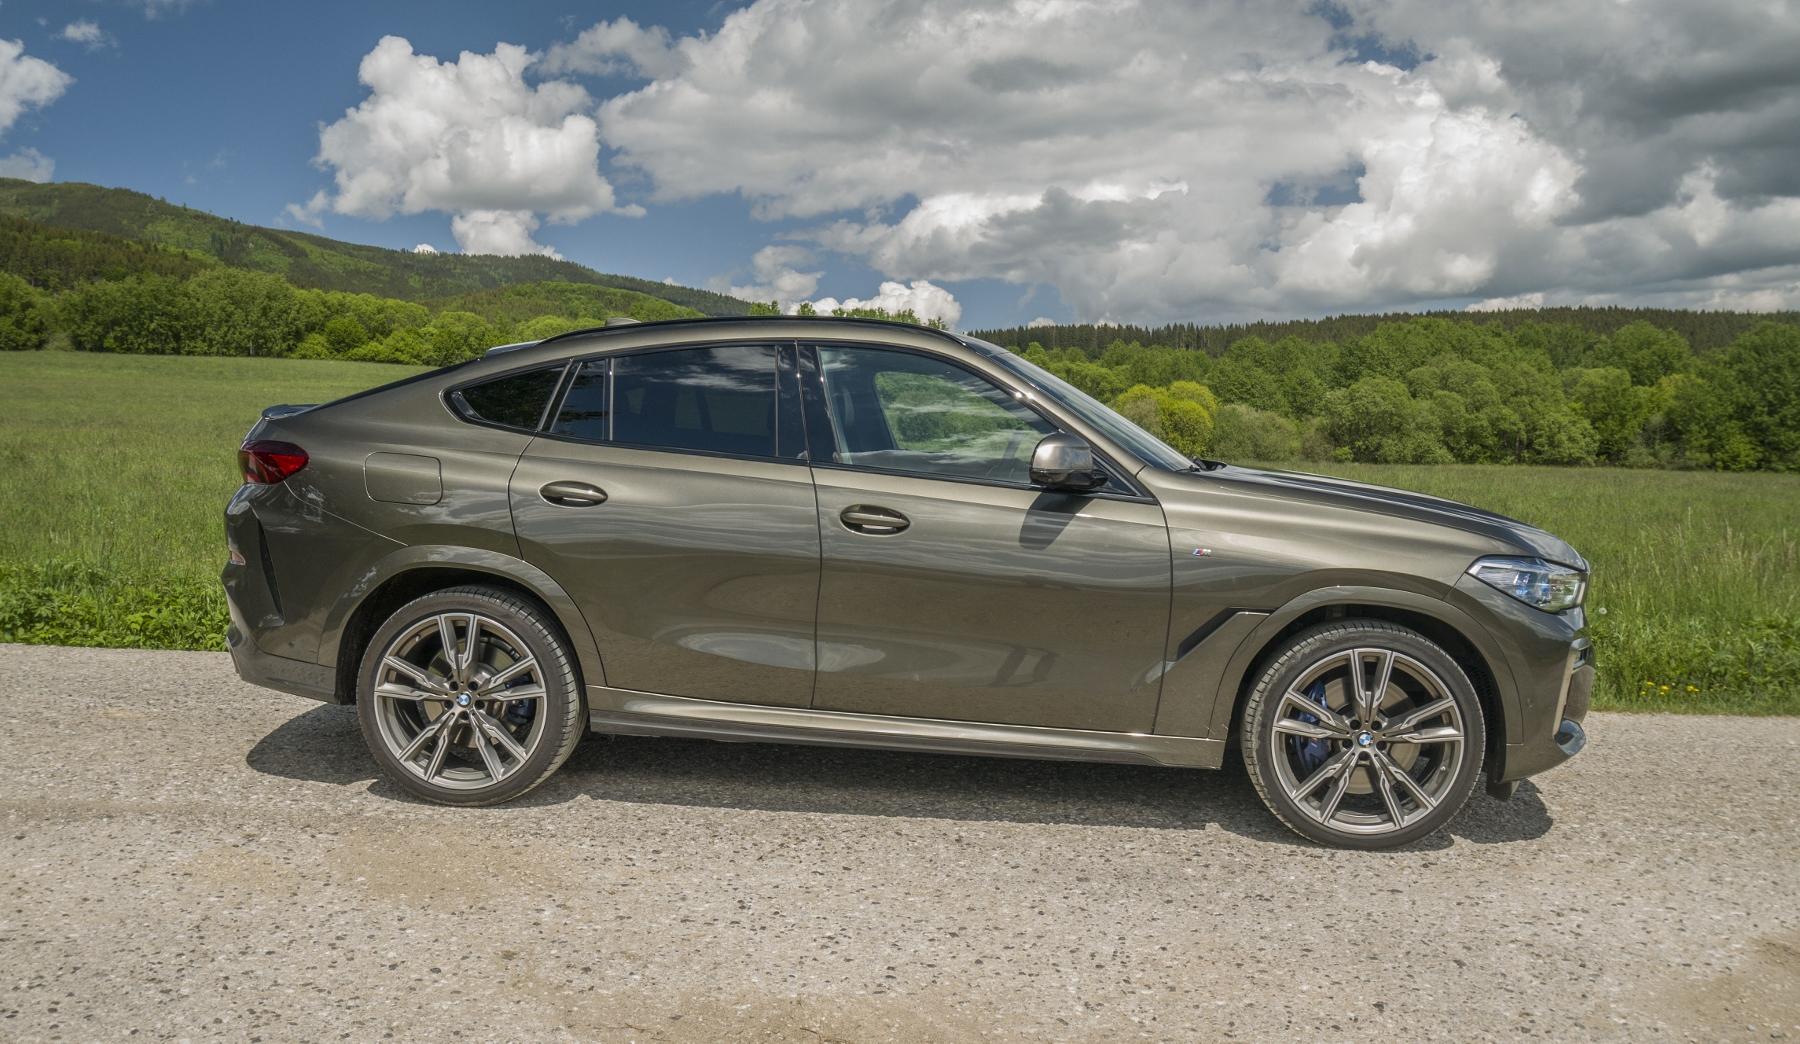 Test: BMW X6 M50i napína benzínové svaly, ale neukazuje plnú silu ZhCCDghrpU bmw-x6-m50i-7